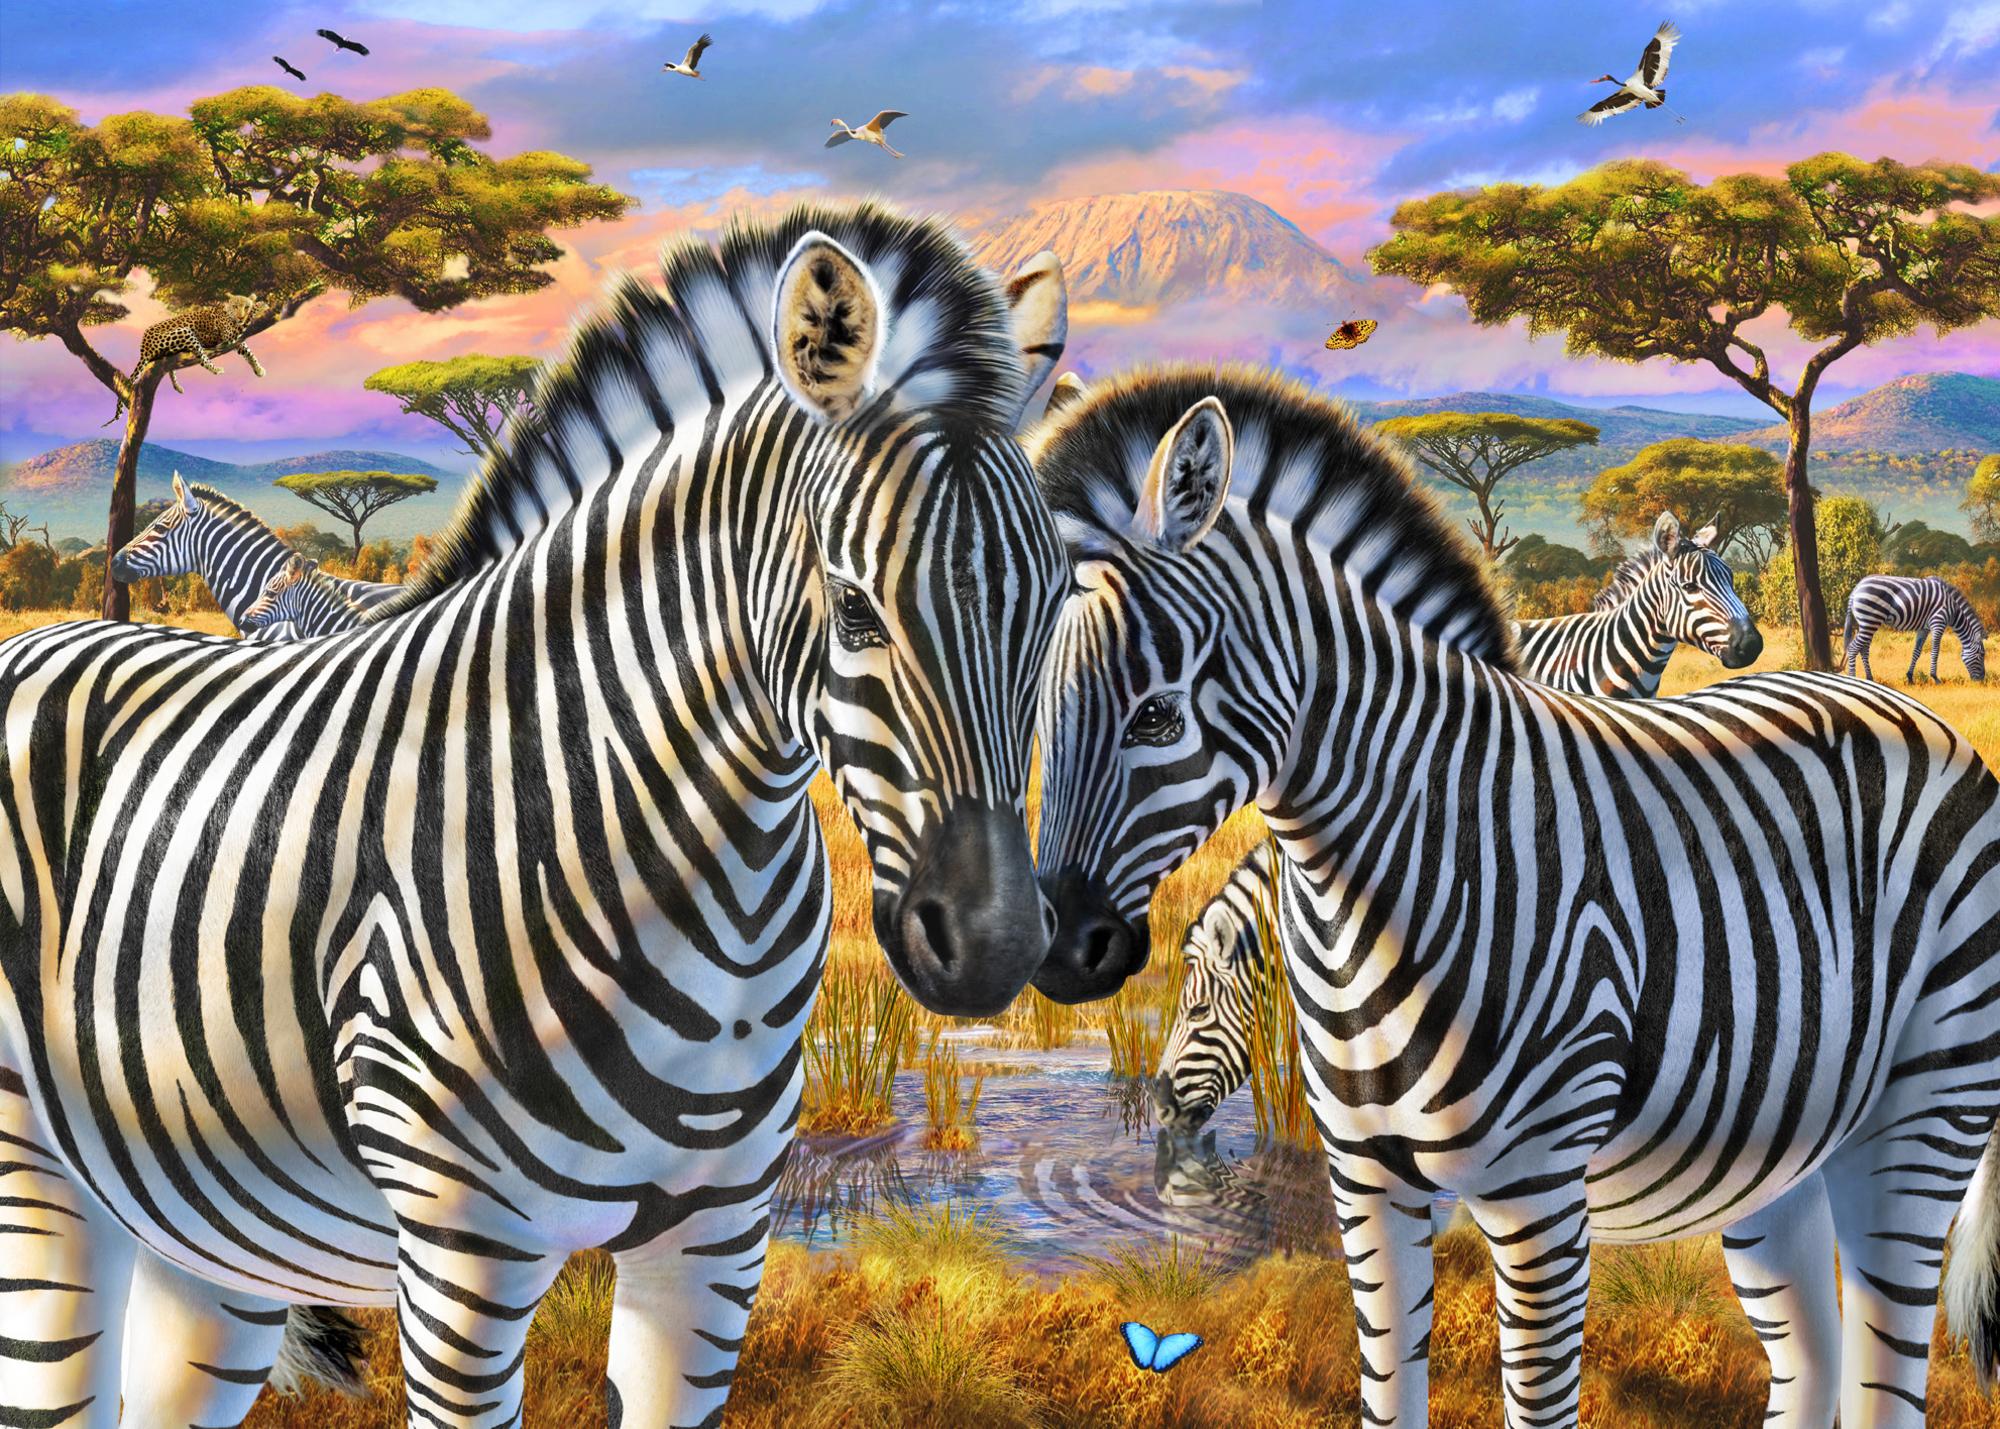 loving zebras wall mural amp loving zebras wallpaper wallsauce zebra wall mural decal jungle safari aviation nursery